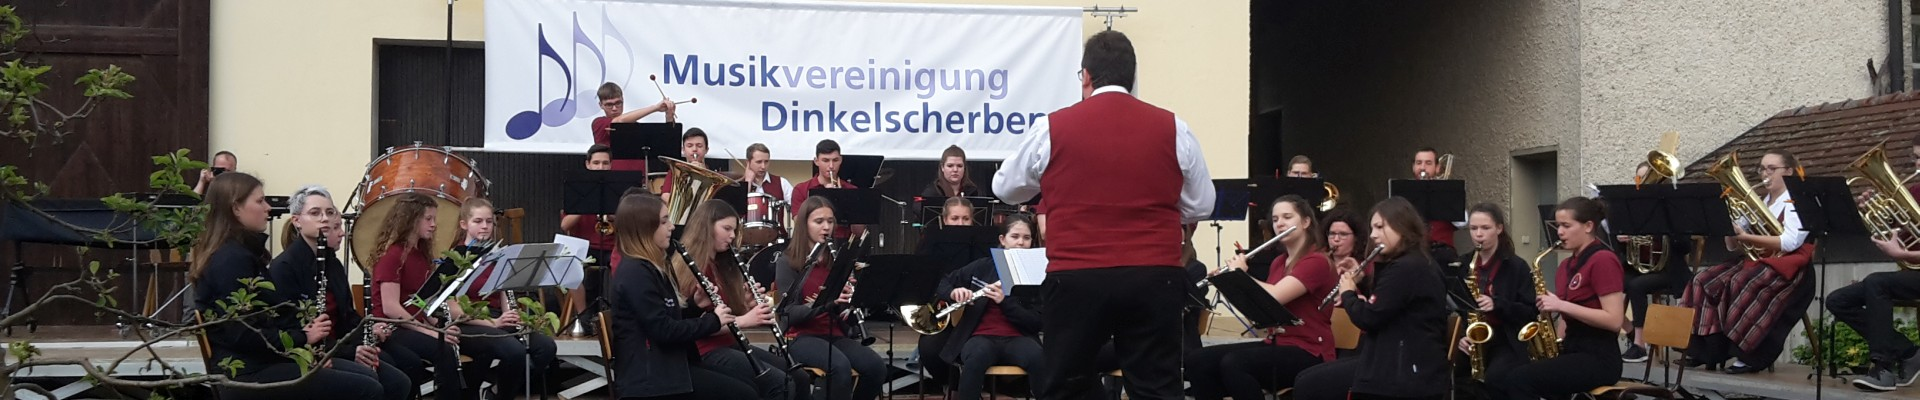 MV_Dinkelscherben_20190519.jpg